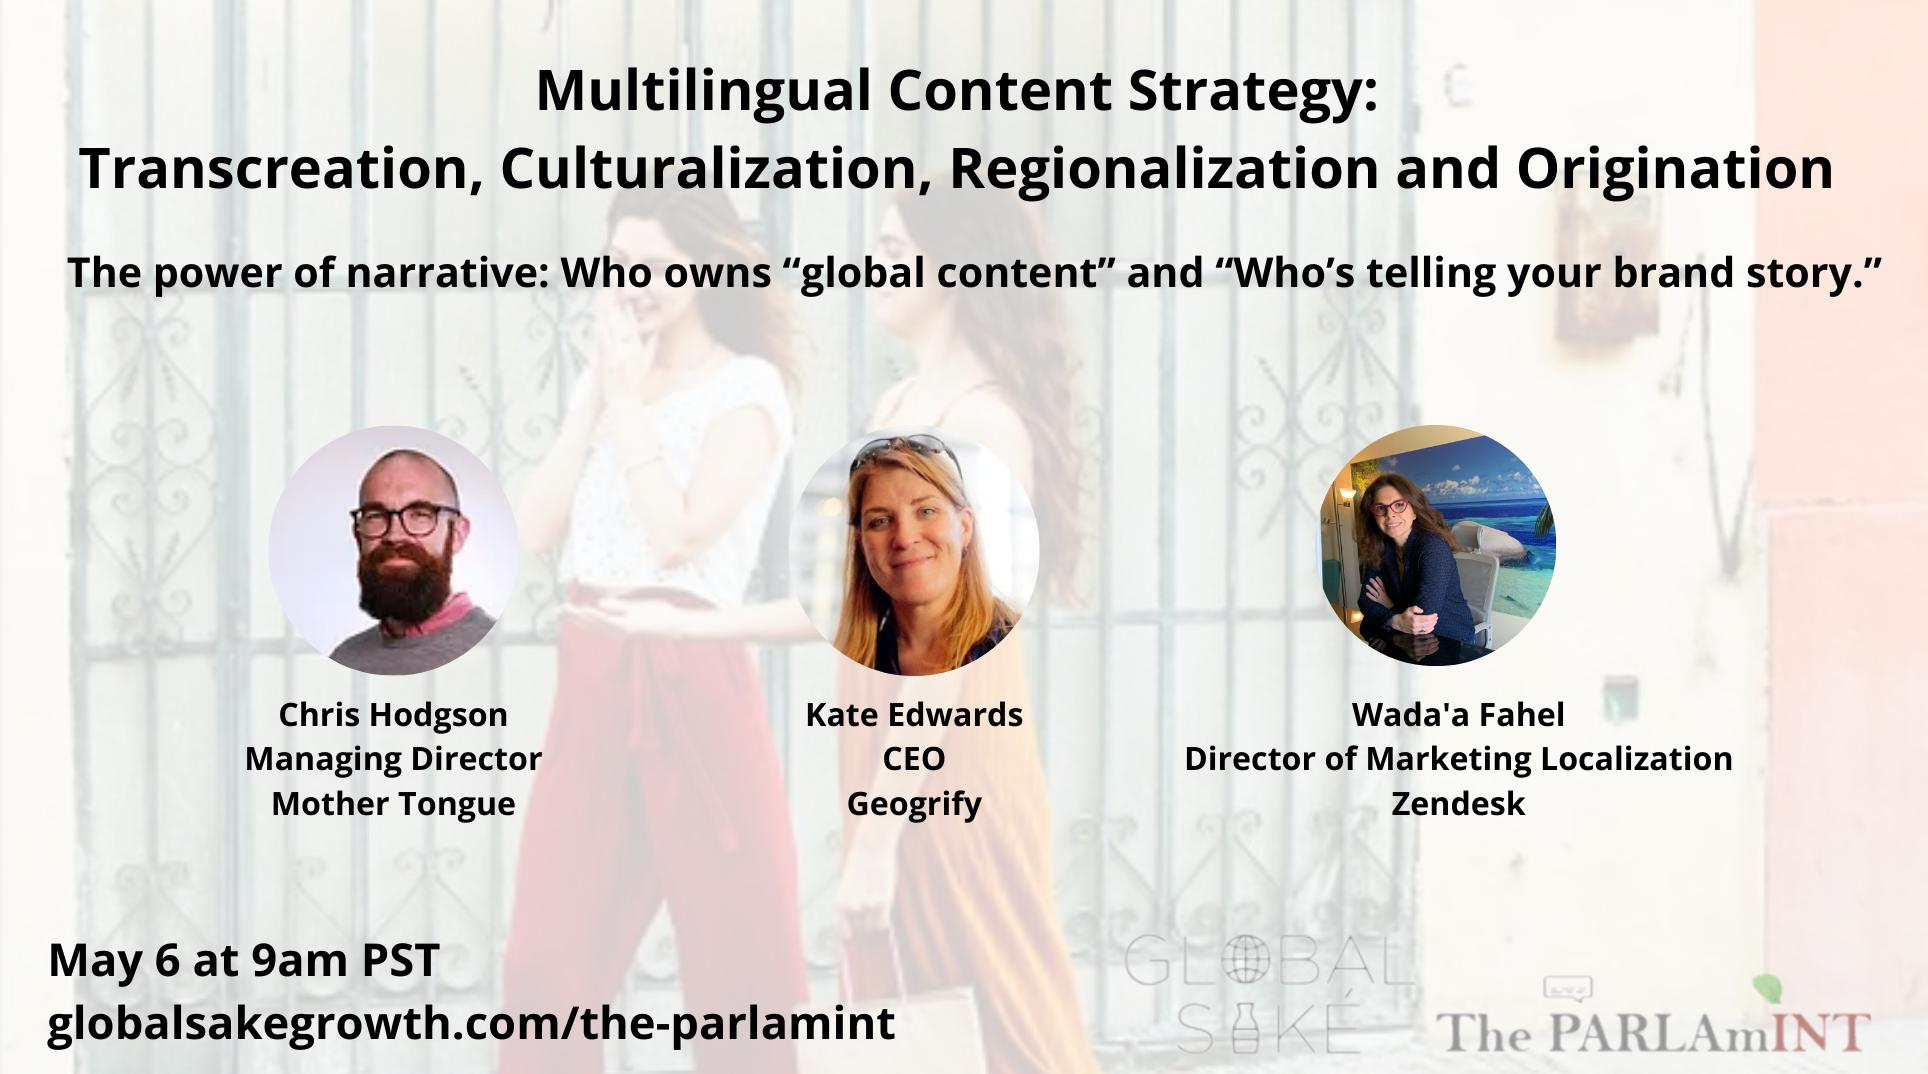 Multilingual content strategy: transcreation, culturalization, regionalization and local content origination